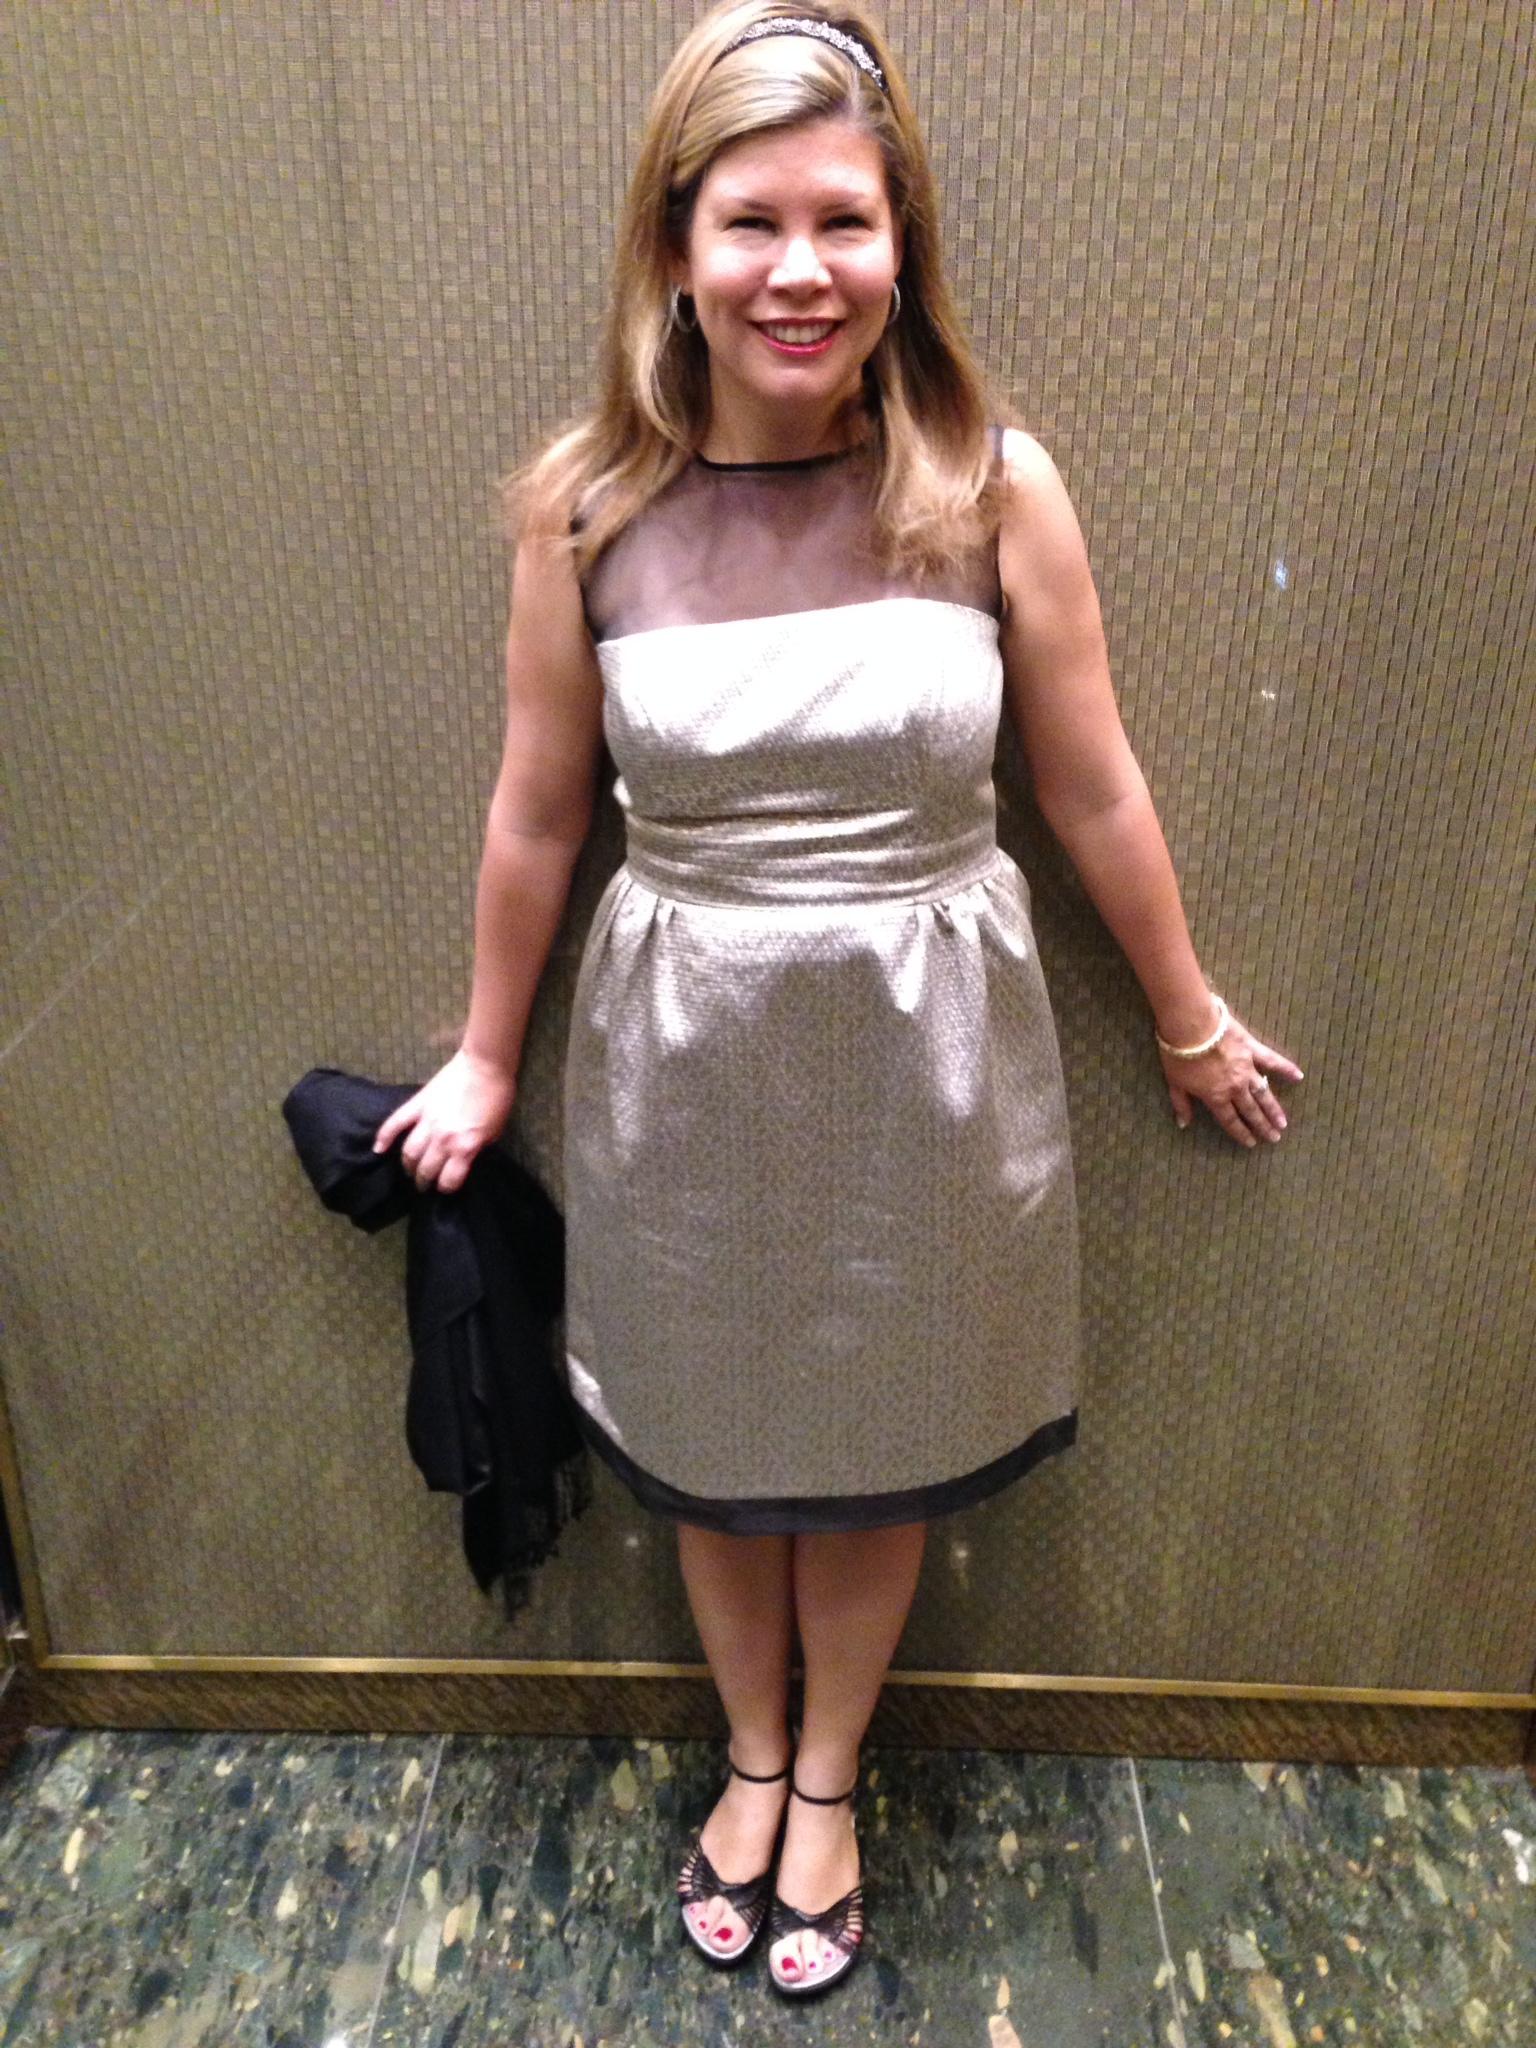 My dress matches the elevator!